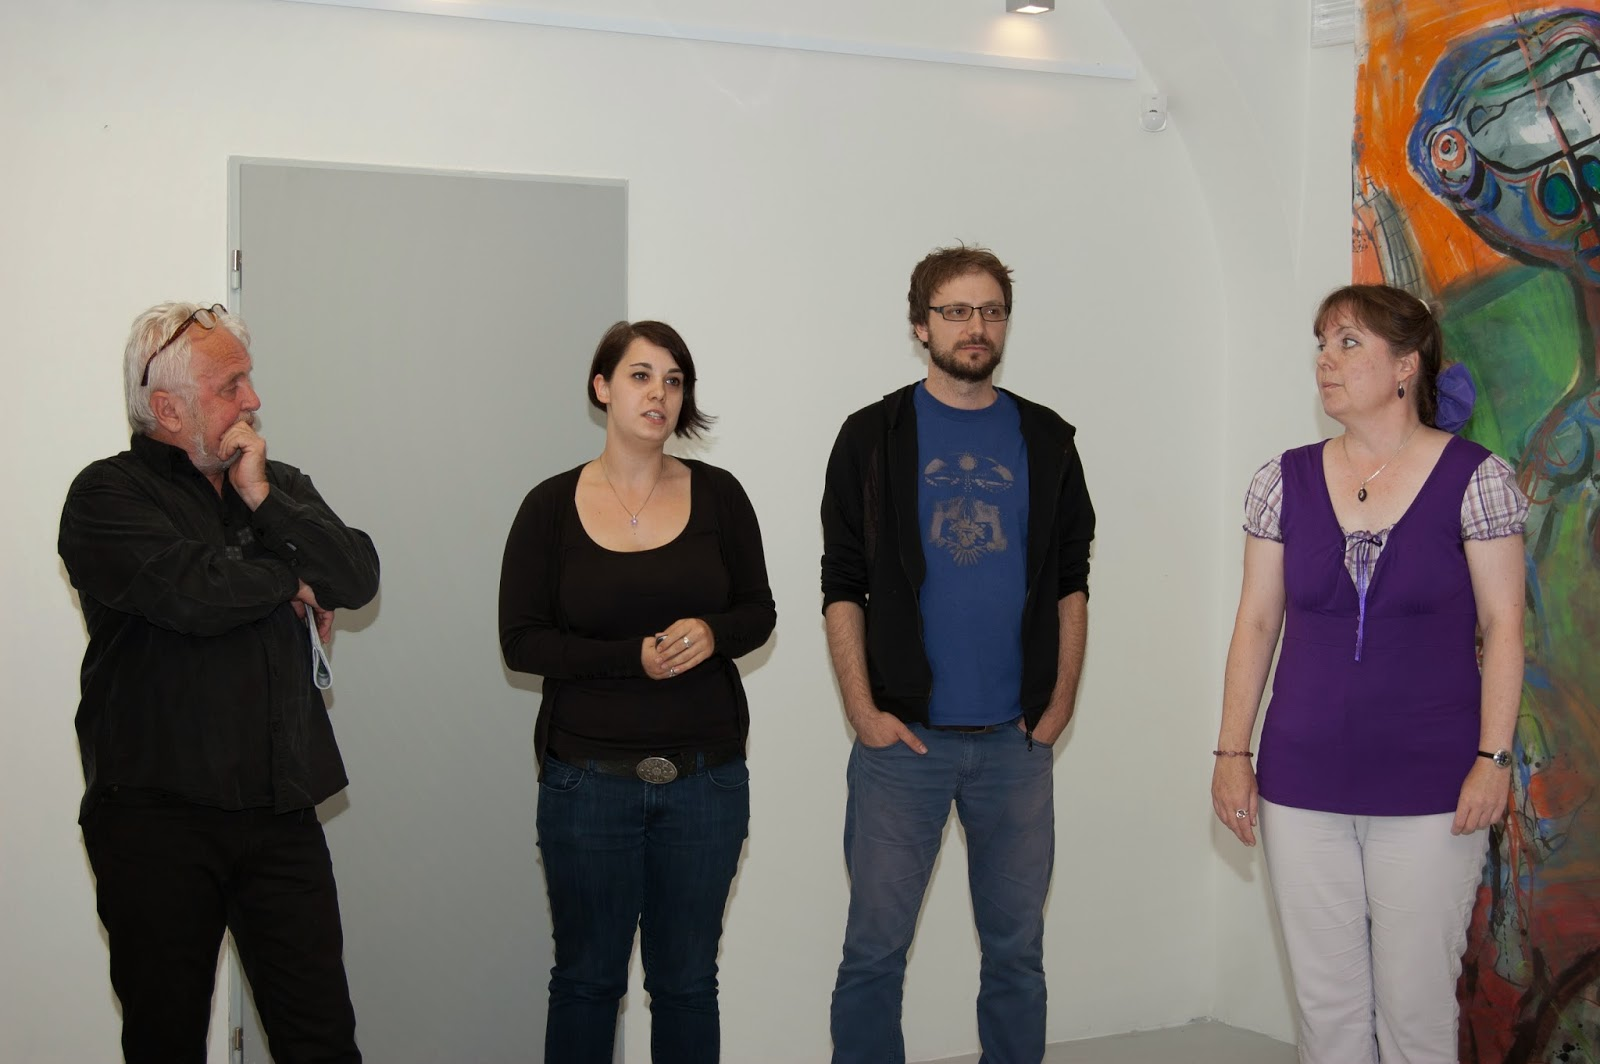 ArtCamp 2014, doprovodný program / free-time program,